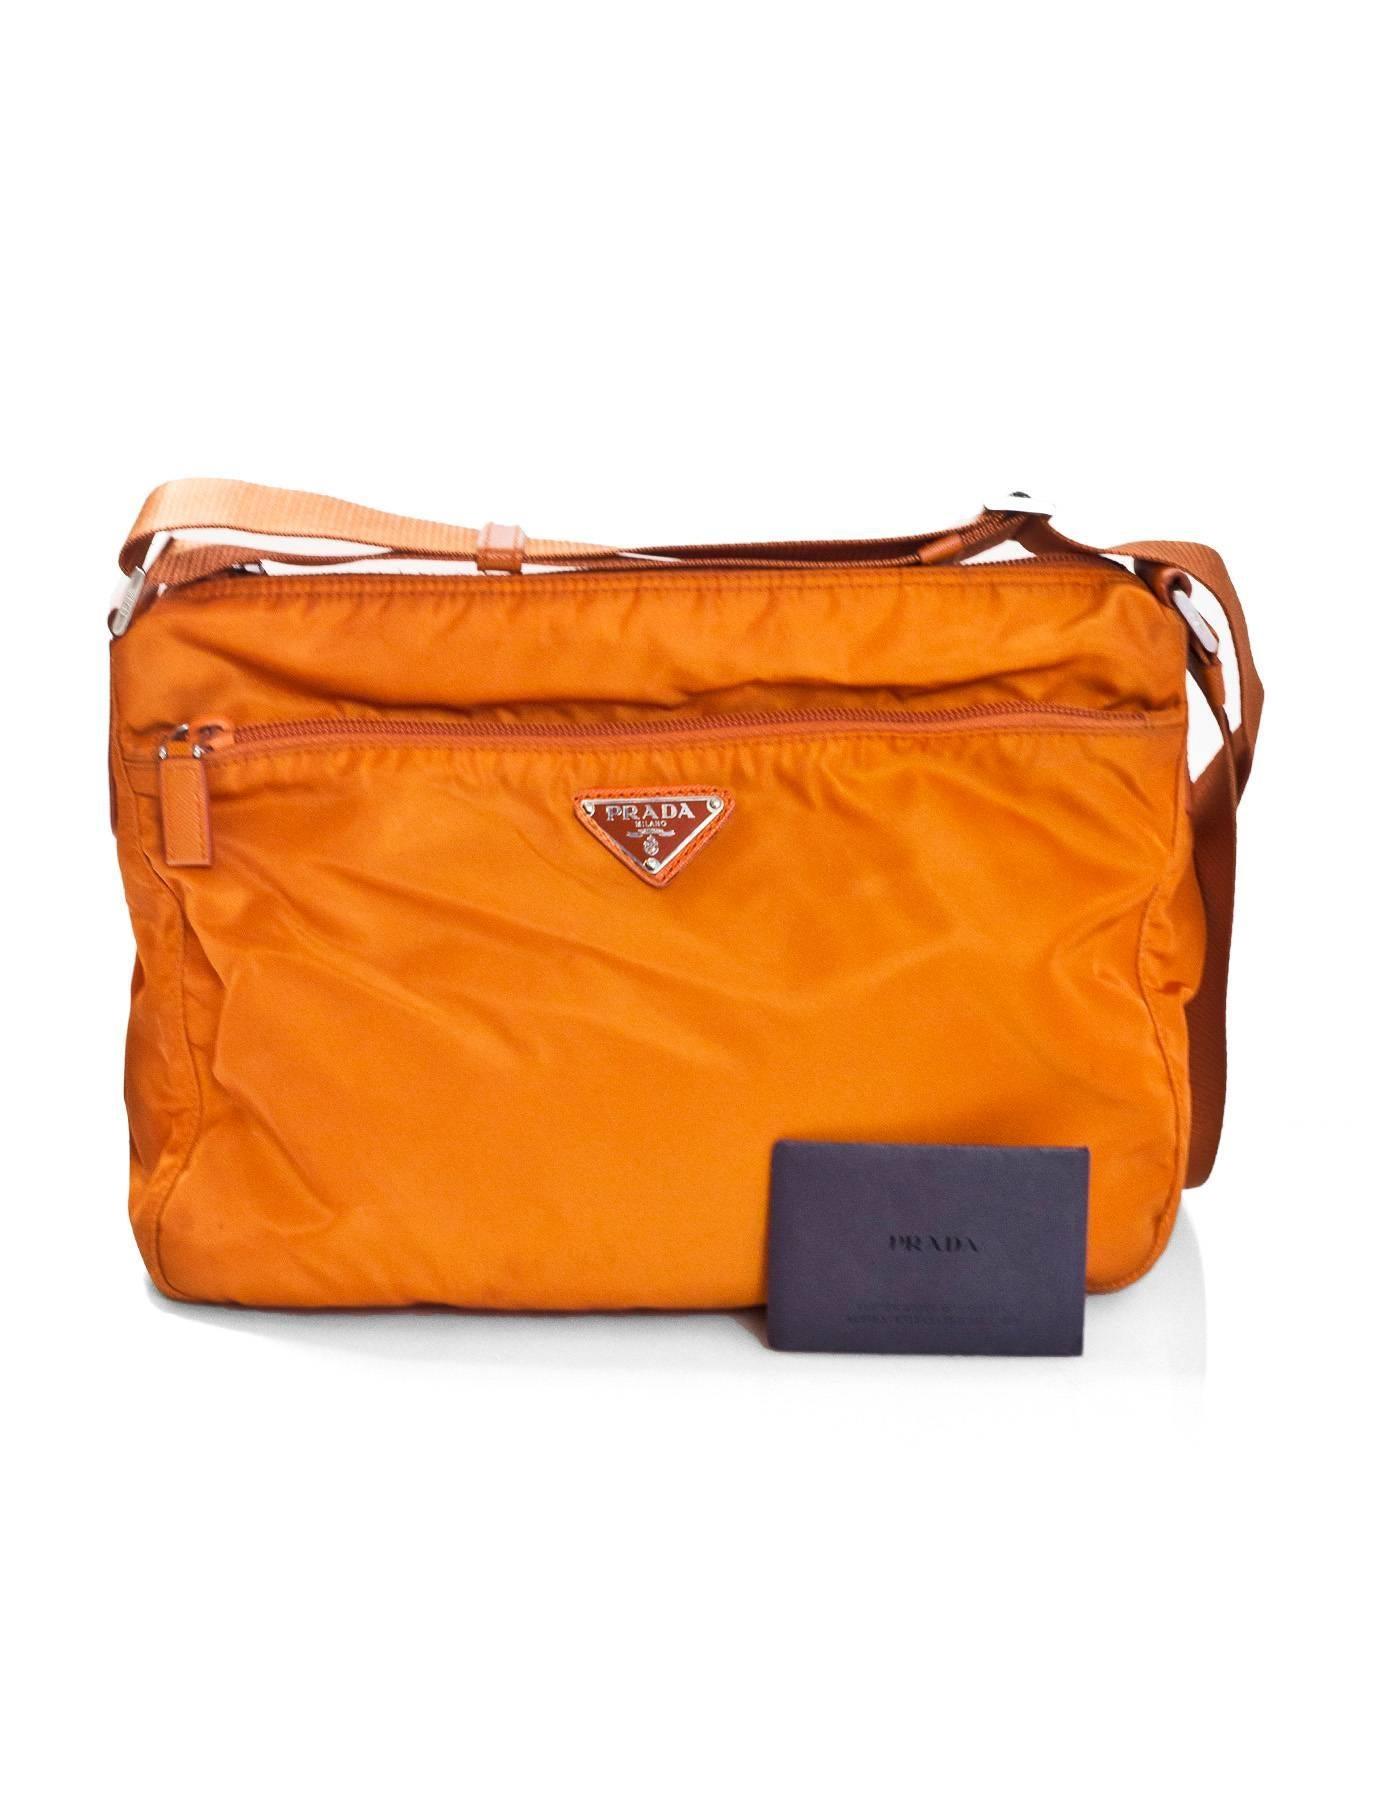 98f239306d96 Prada Orange Tessuto Nylon Messenger Crossbody Bag For Sale at 1stdibs